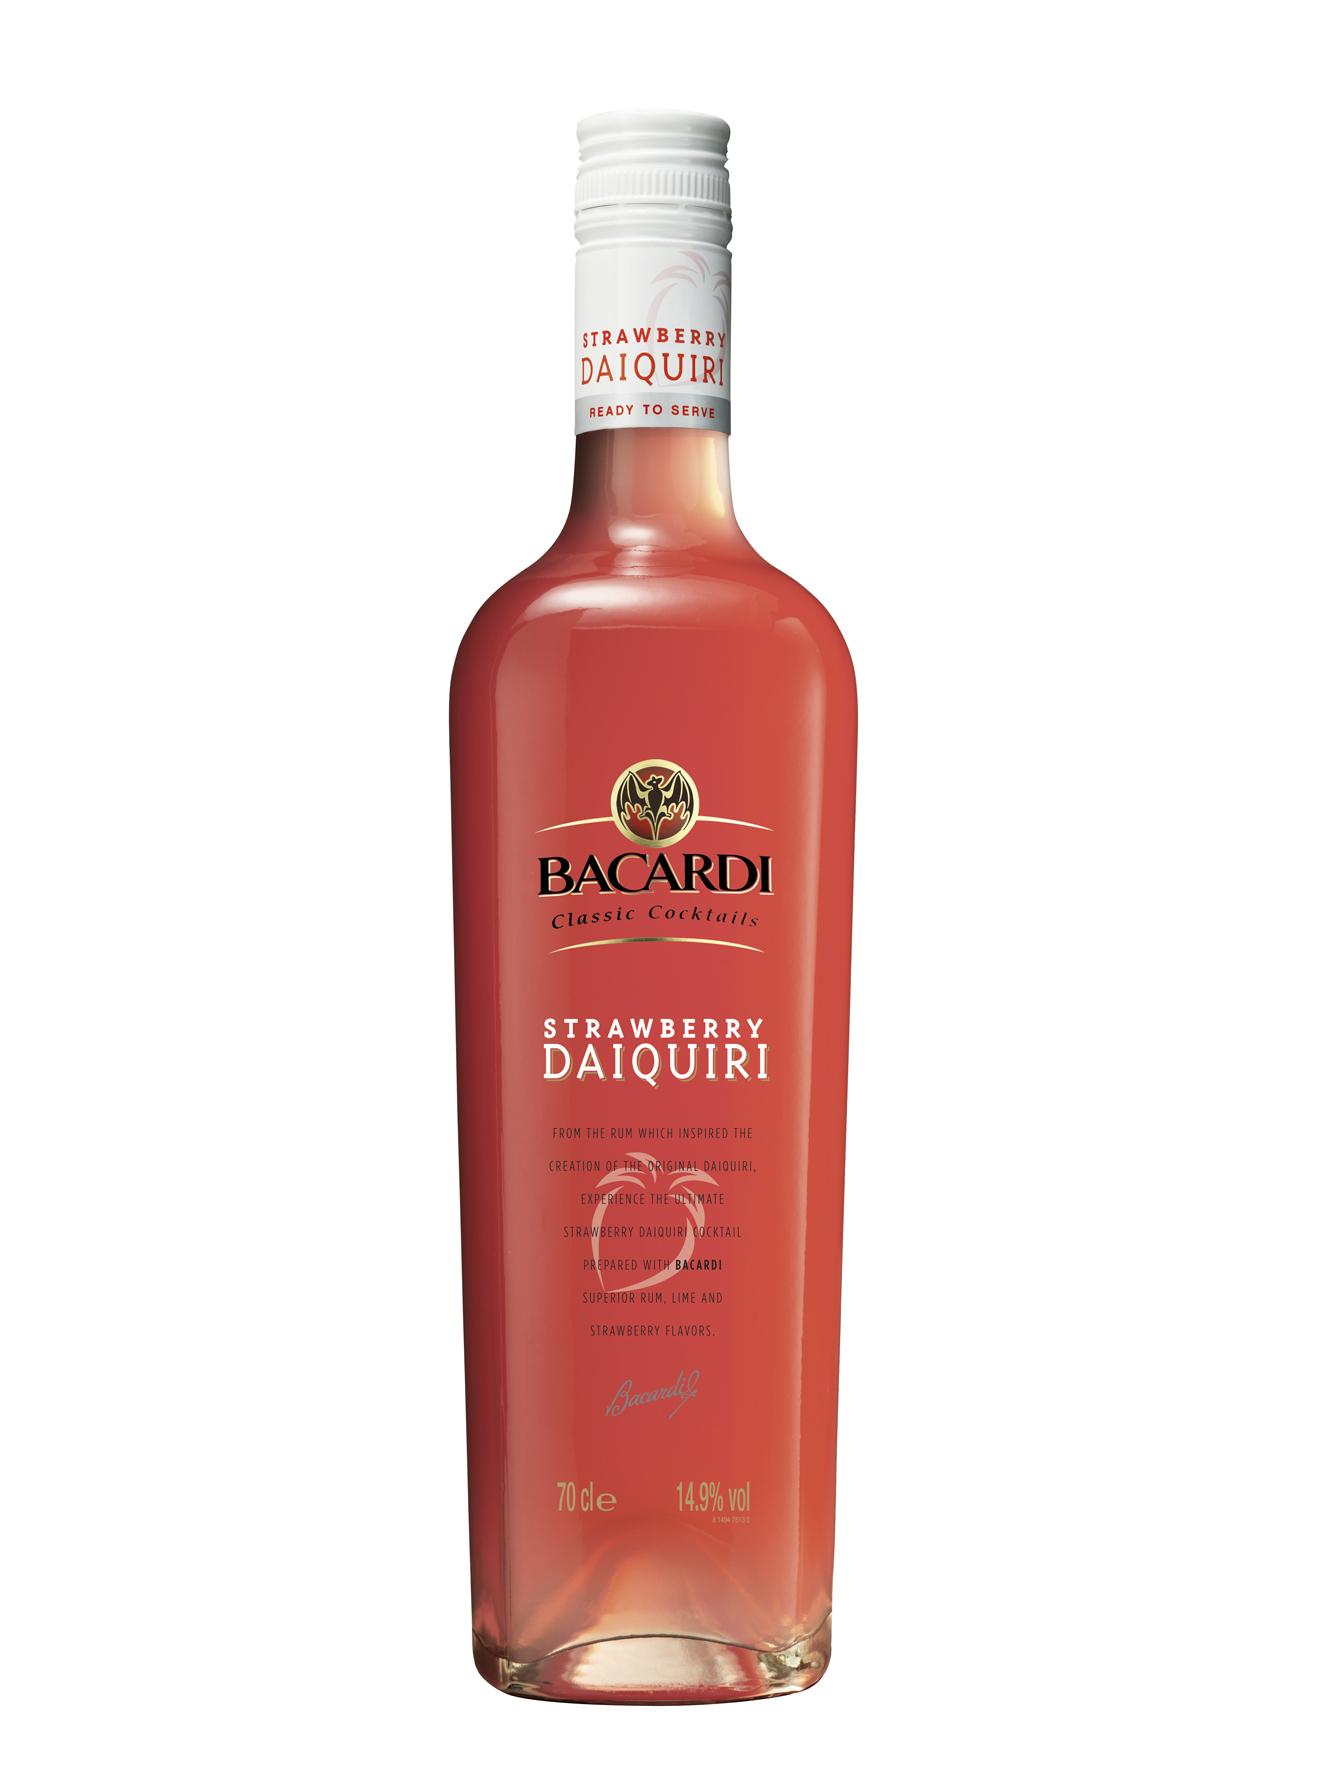 Bacardi daiquiri vinmonopolet